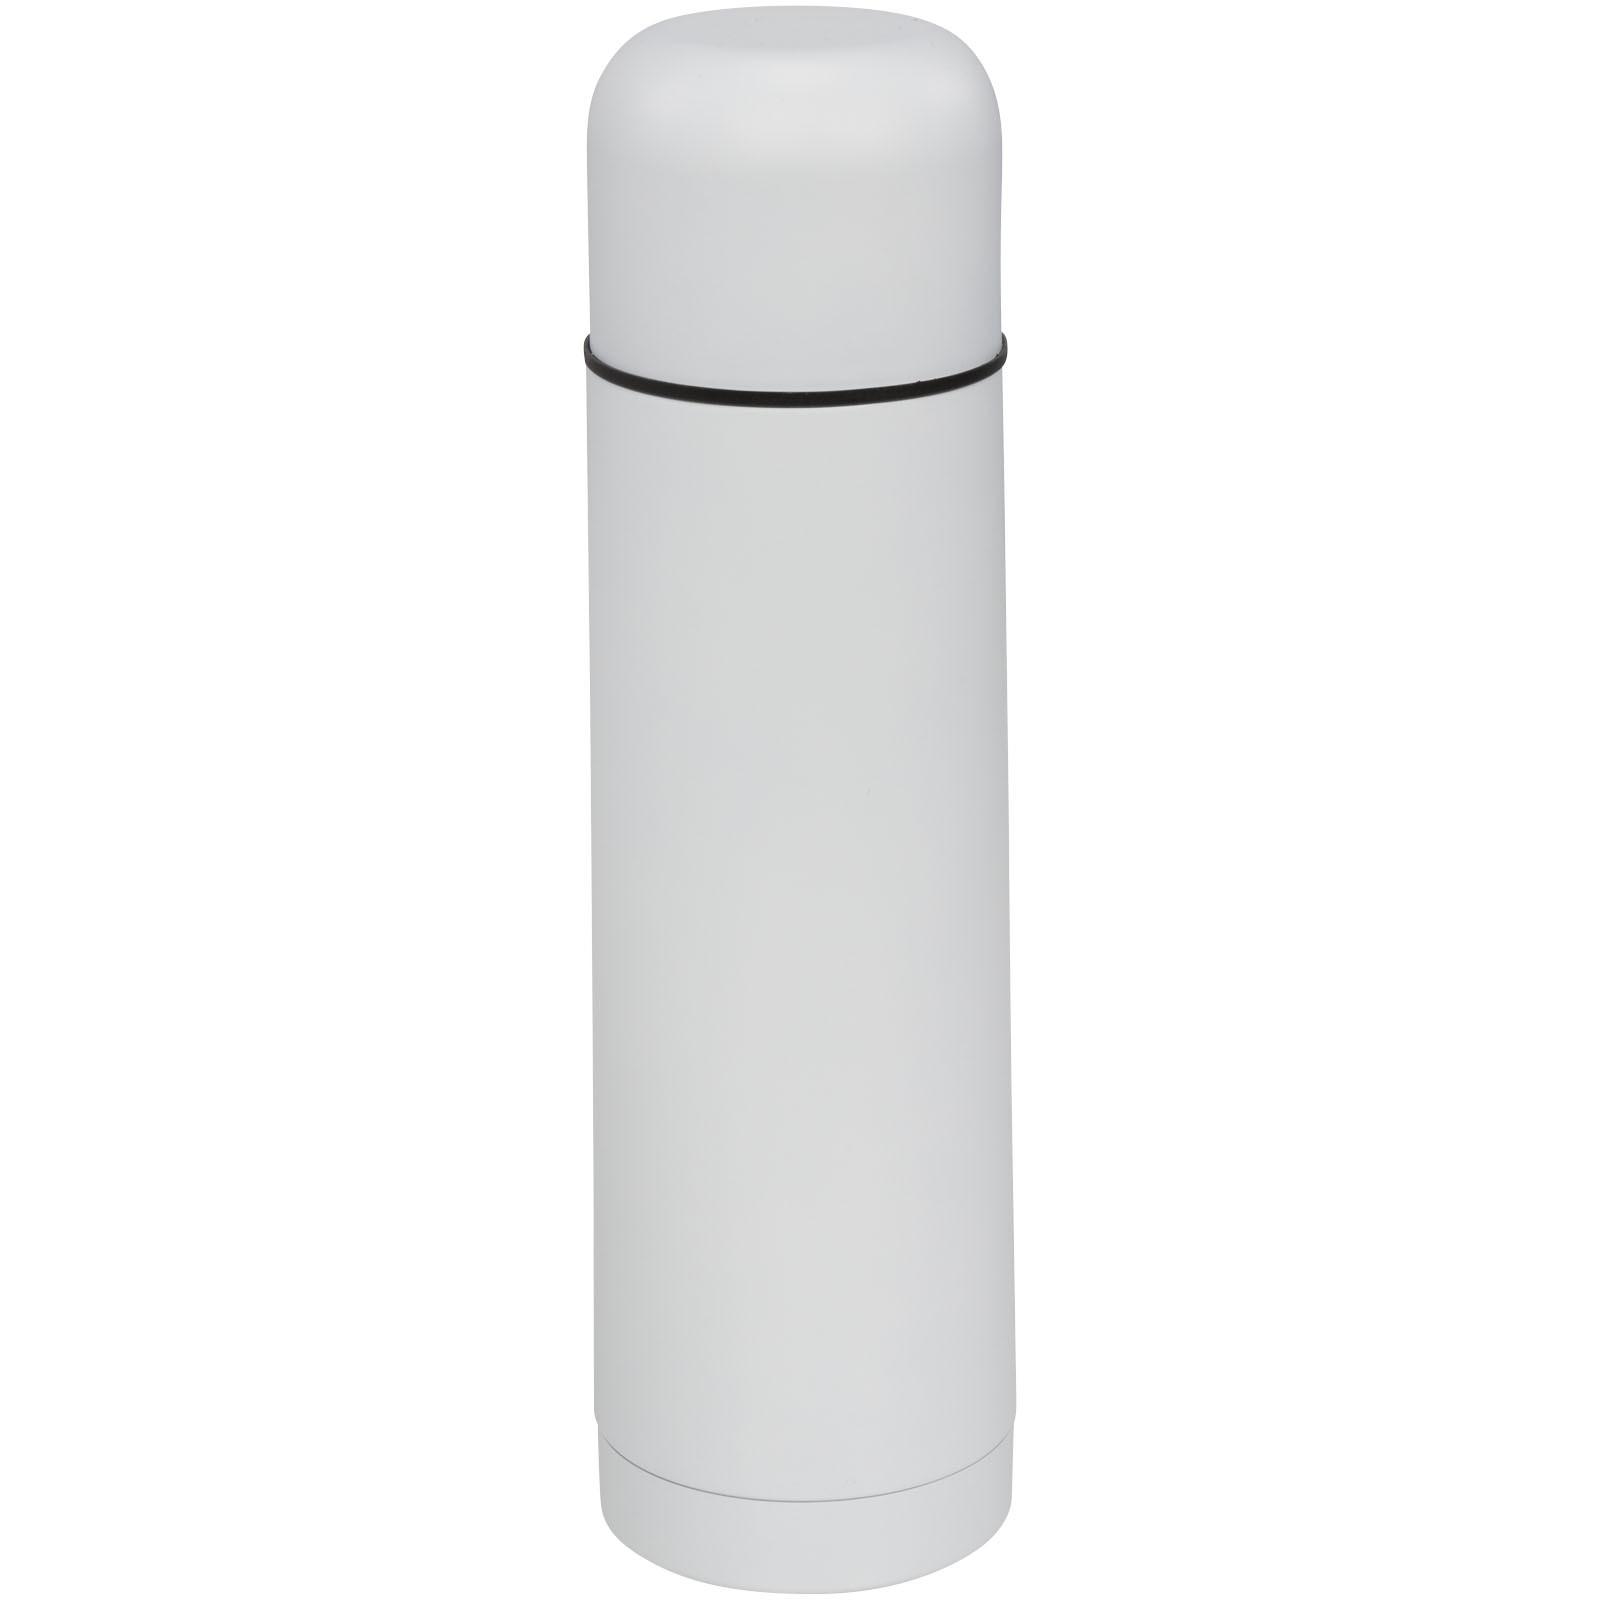 Matová vakuová termoska Gallup 500 ml - Bílá